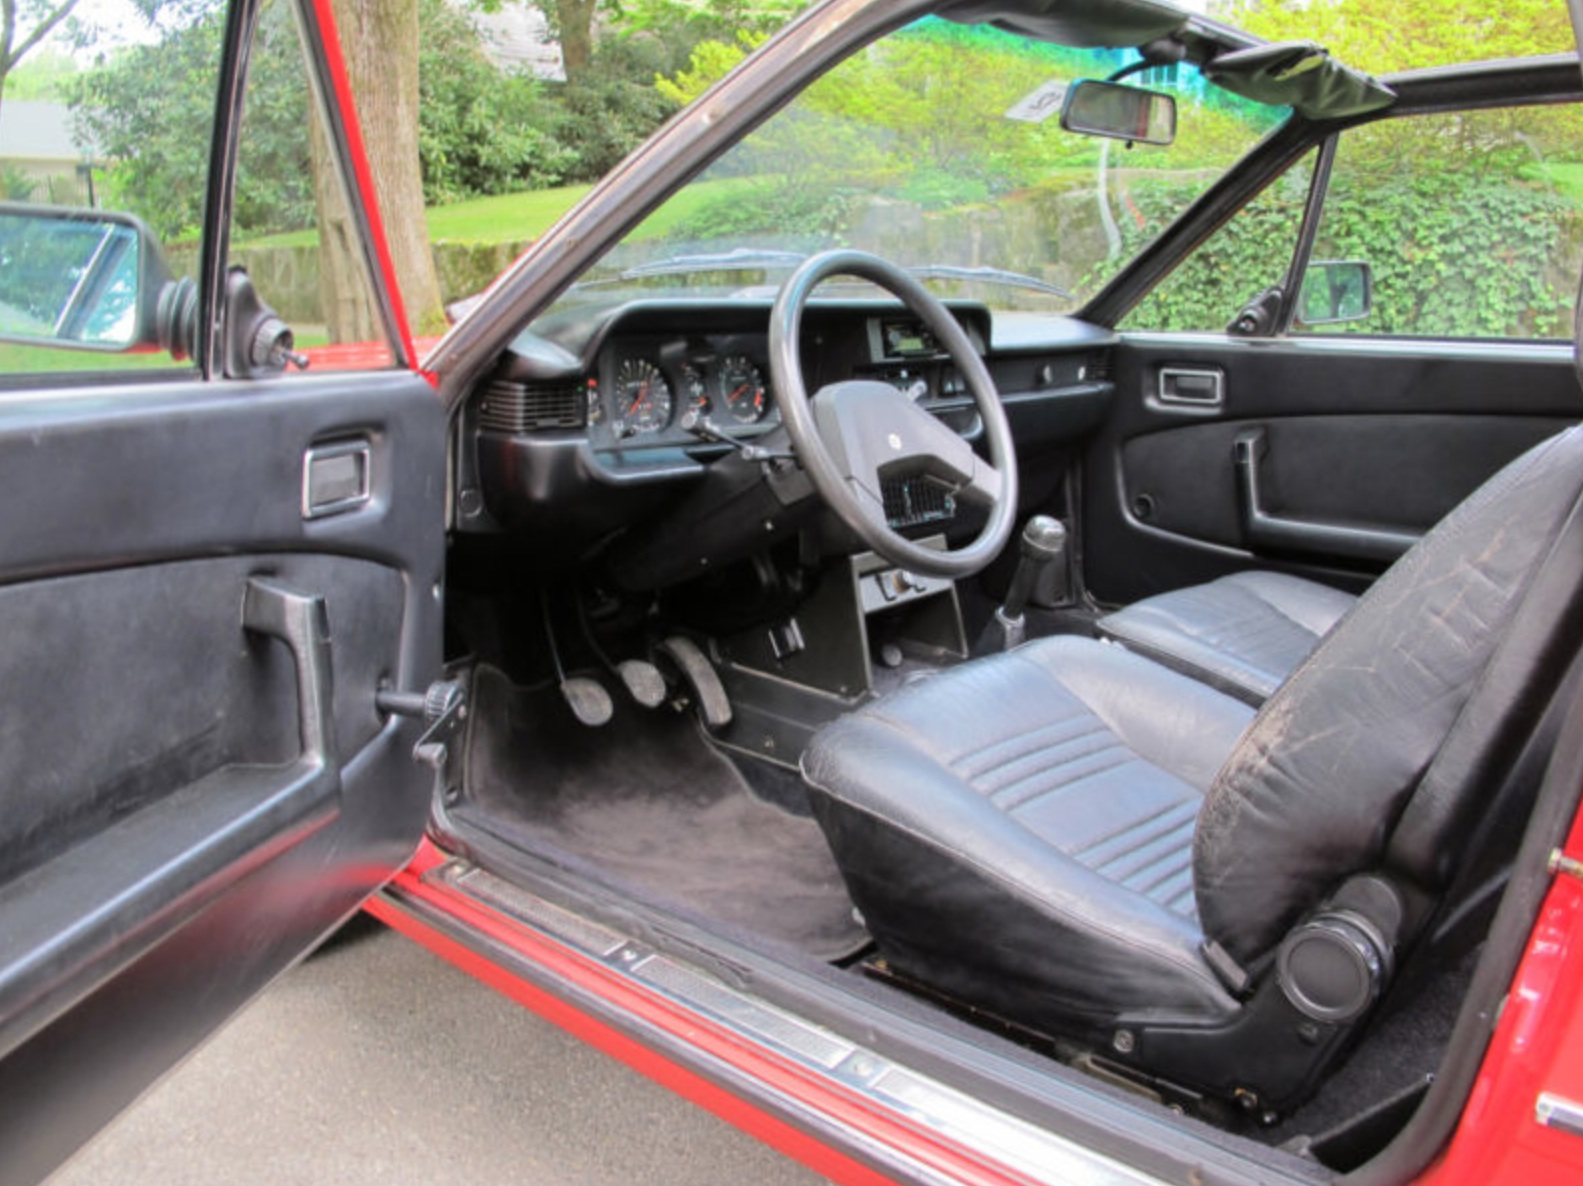 Car Fuse Box For Sale Trusted Wiring Diagrams Renault Megane 5 Gtl Data U2022 1994 Lincoln Town Diagram